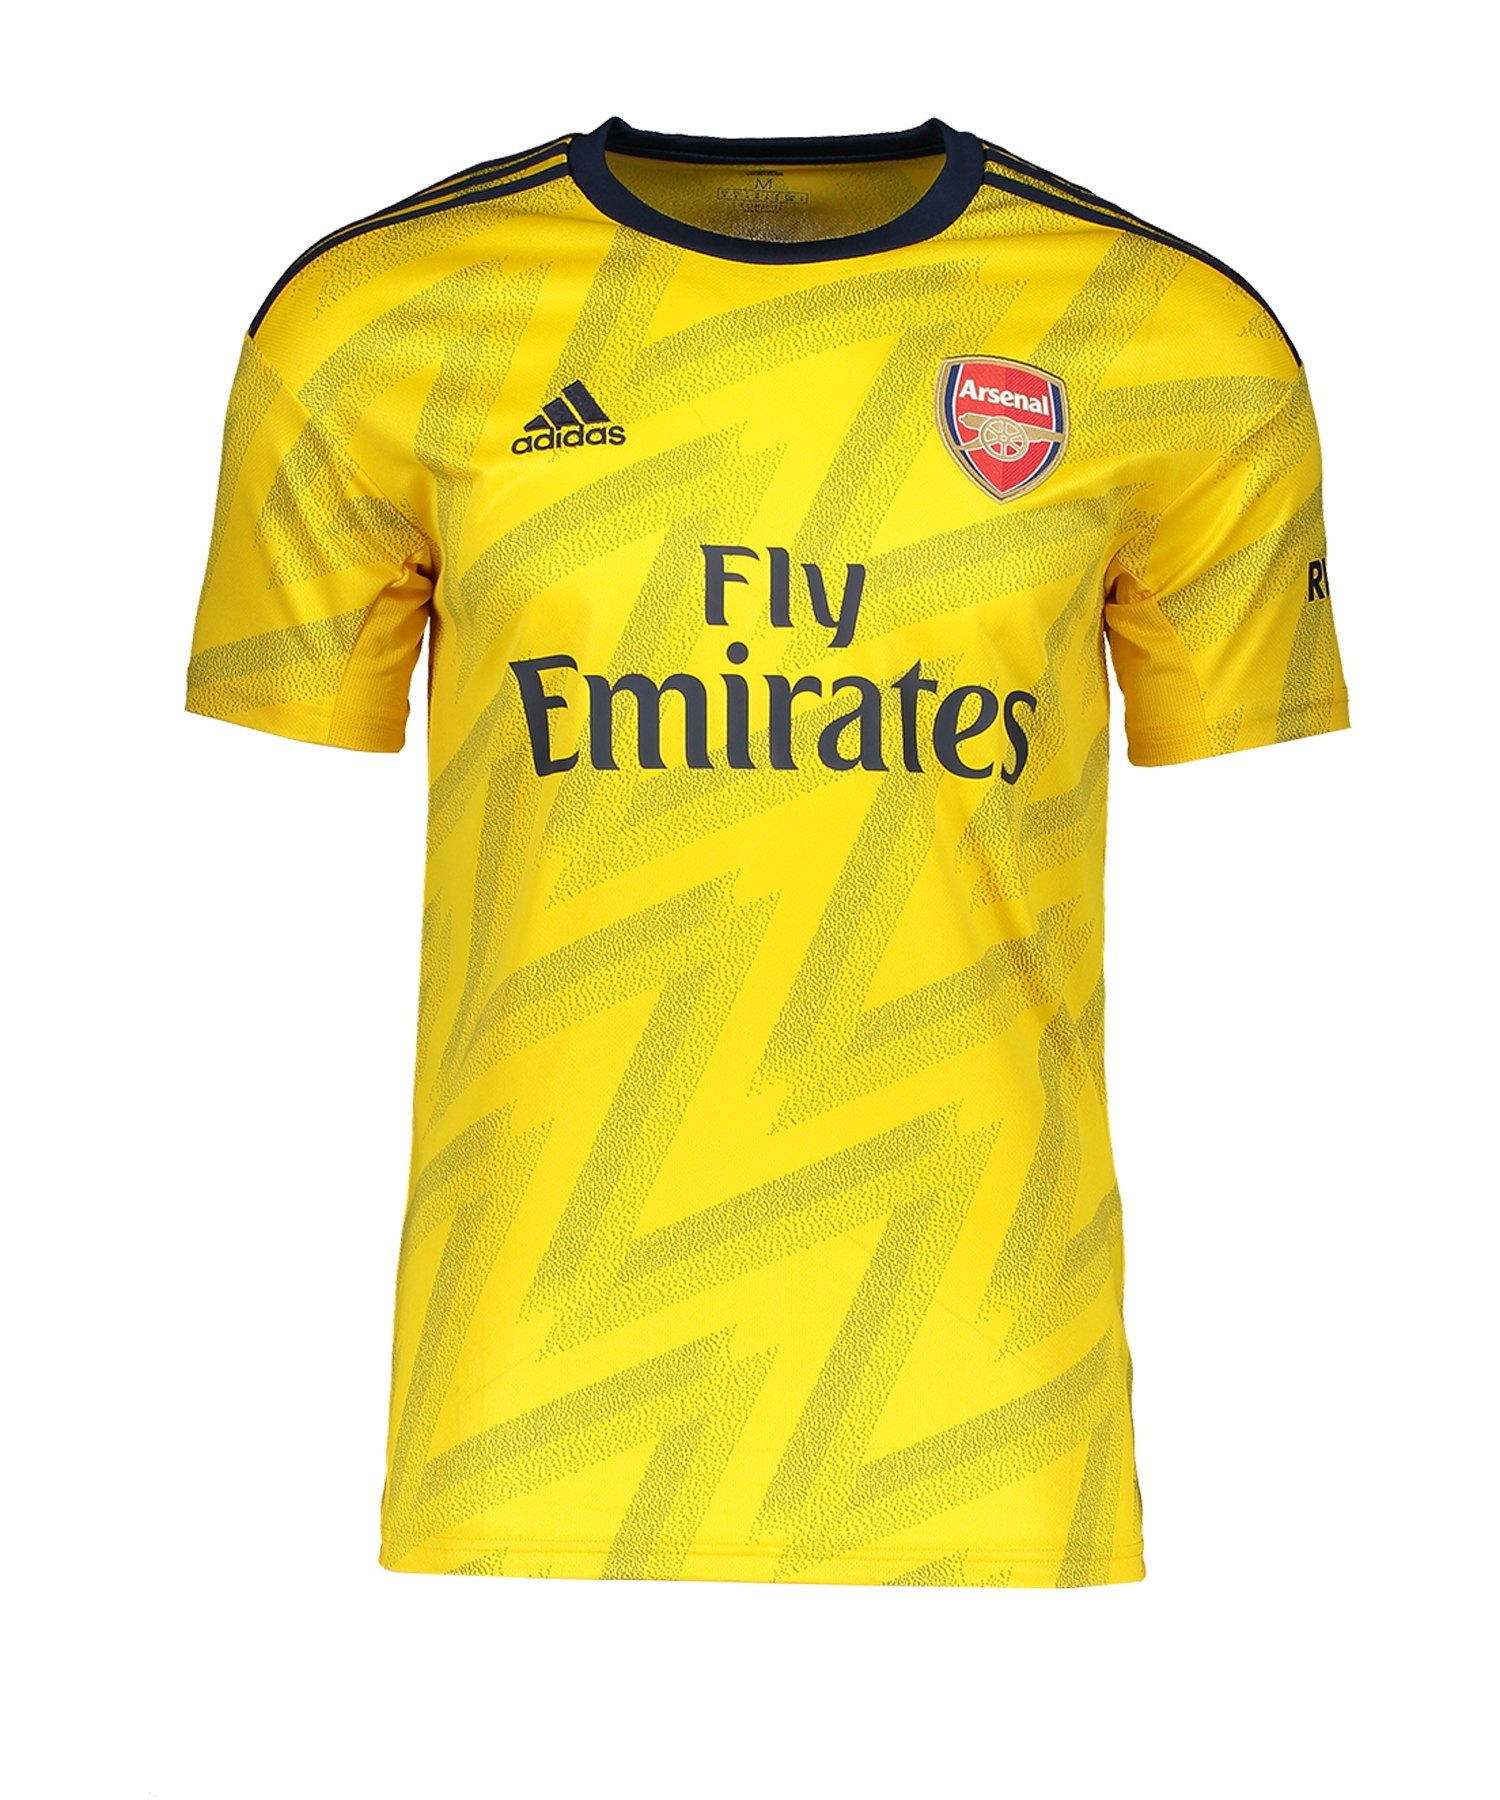 adidas FC Arsenal London Trikot Away 2019/2020 Gelb - gelb